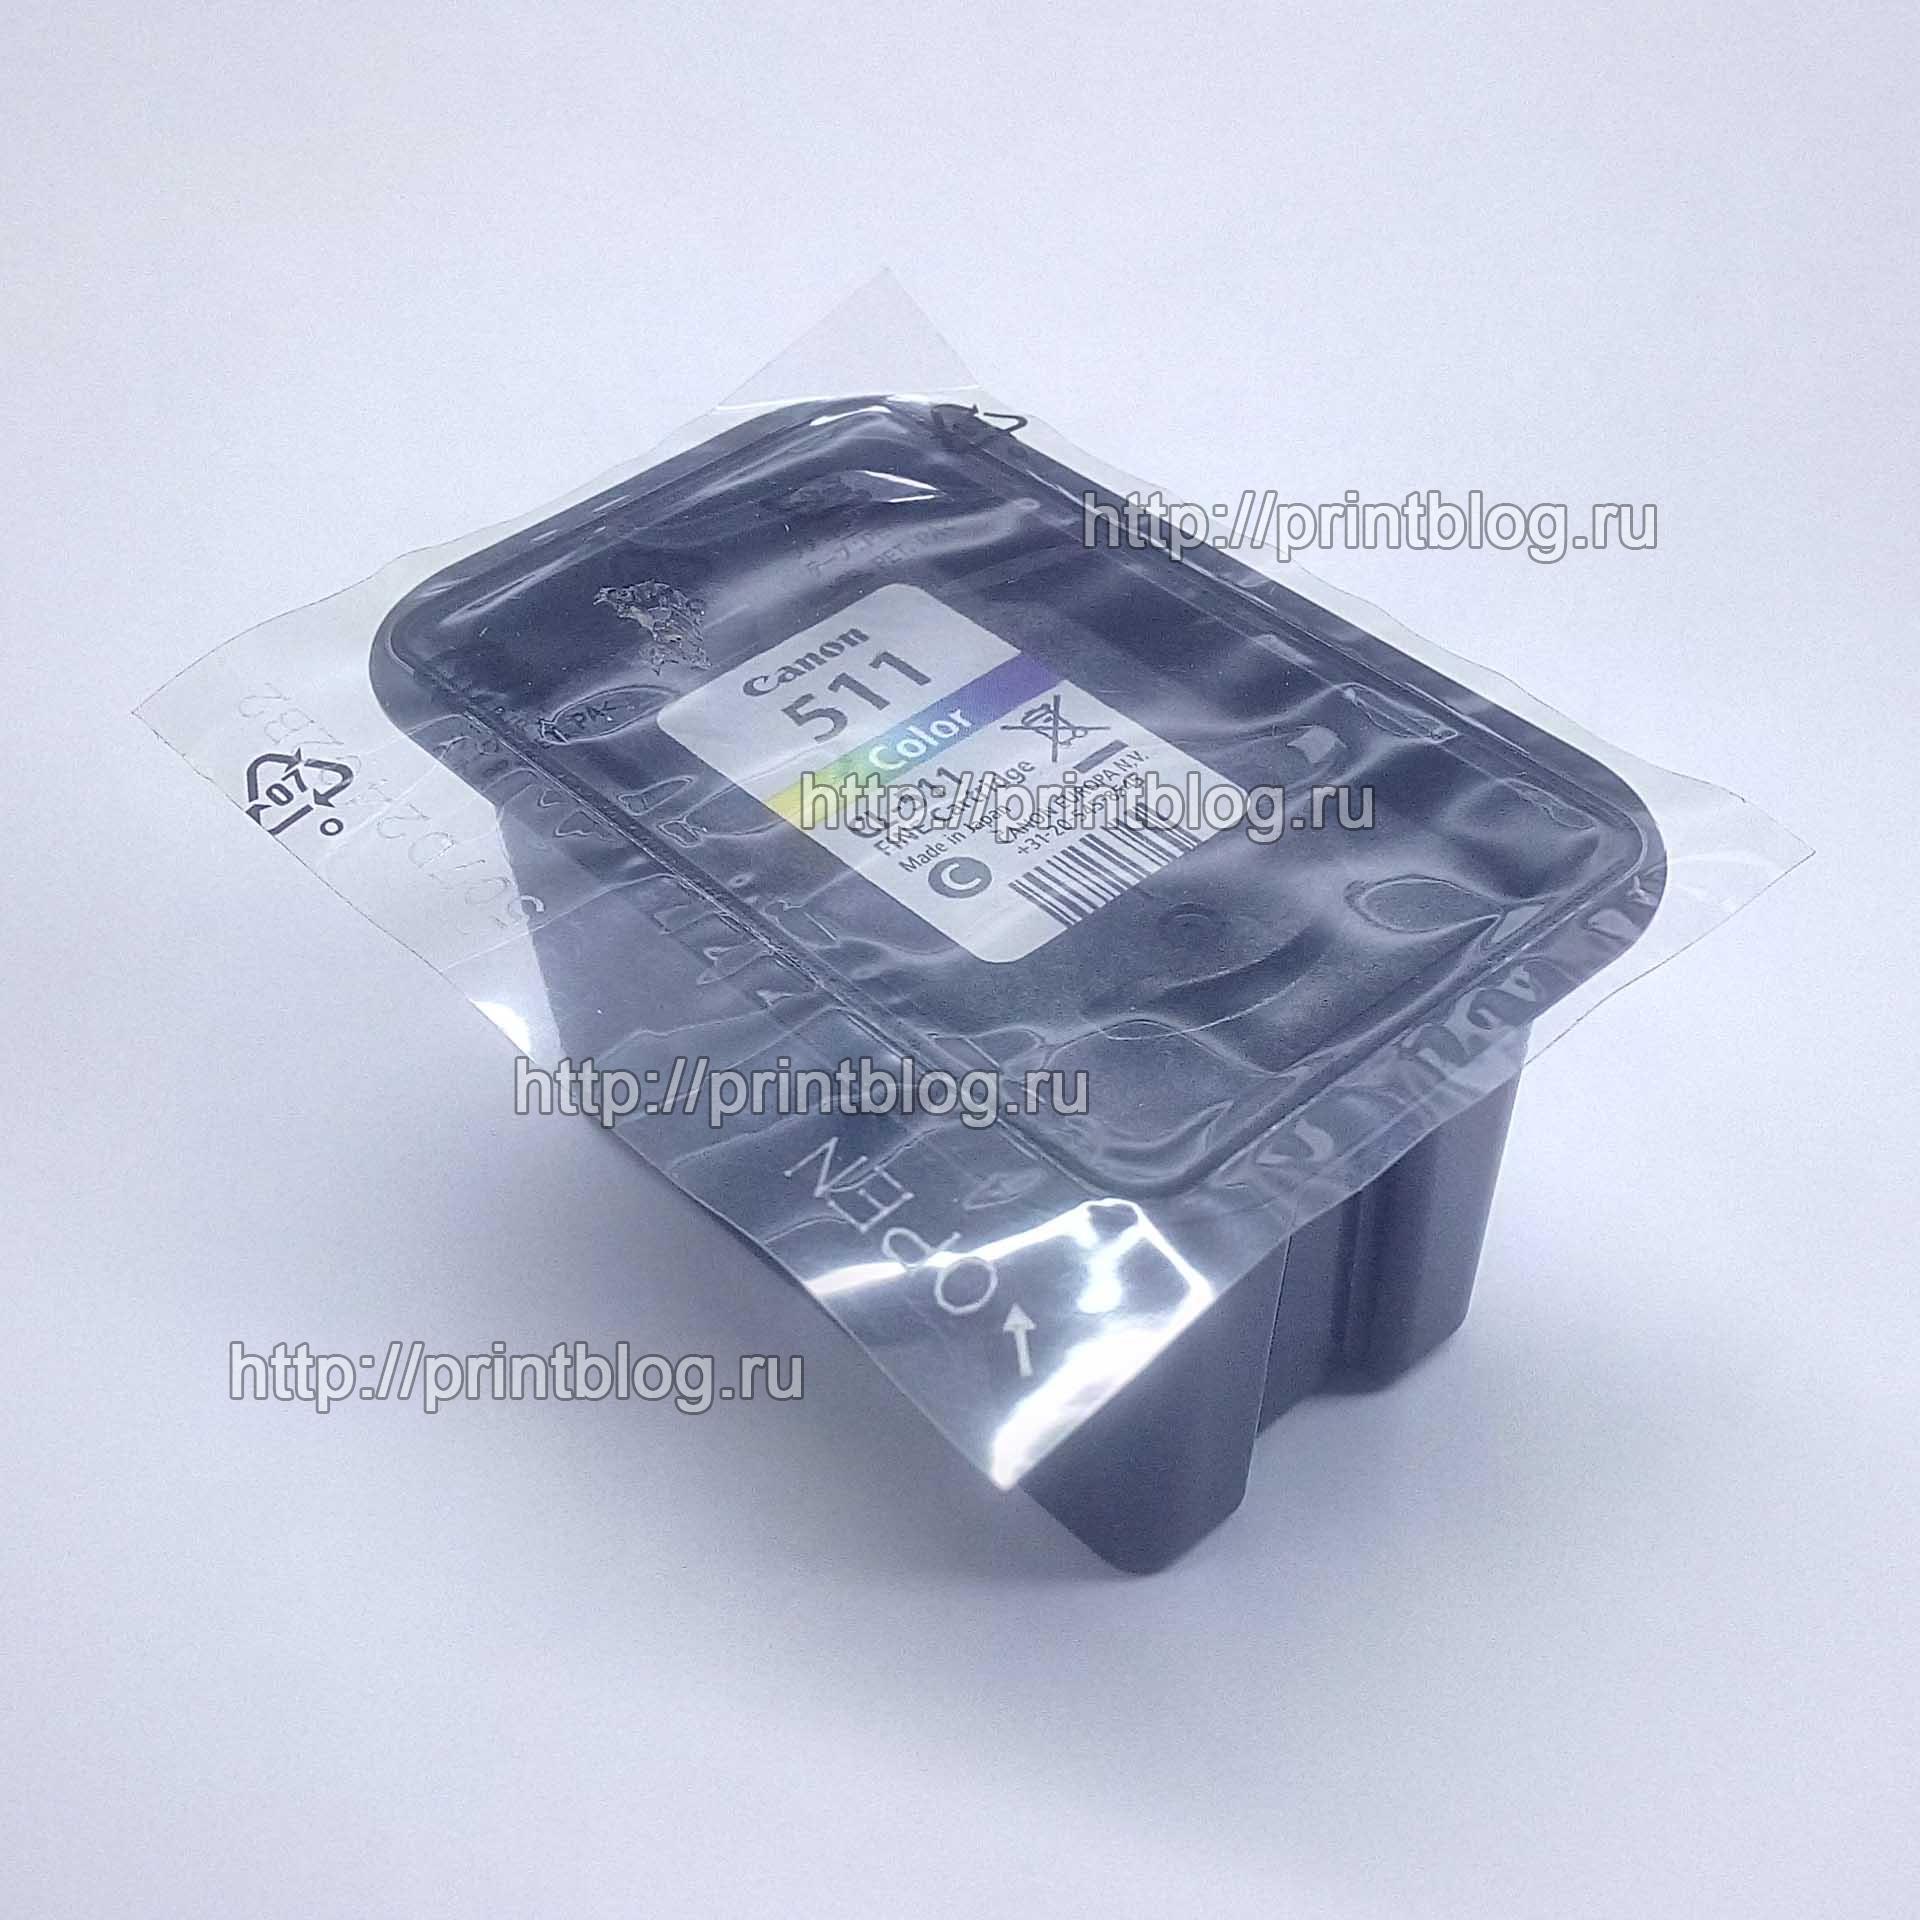 Картридж Canon CL-511 Color для Pixma MP240, 260, 250, 270, 280, 490, 495, MX320 (2972B007)